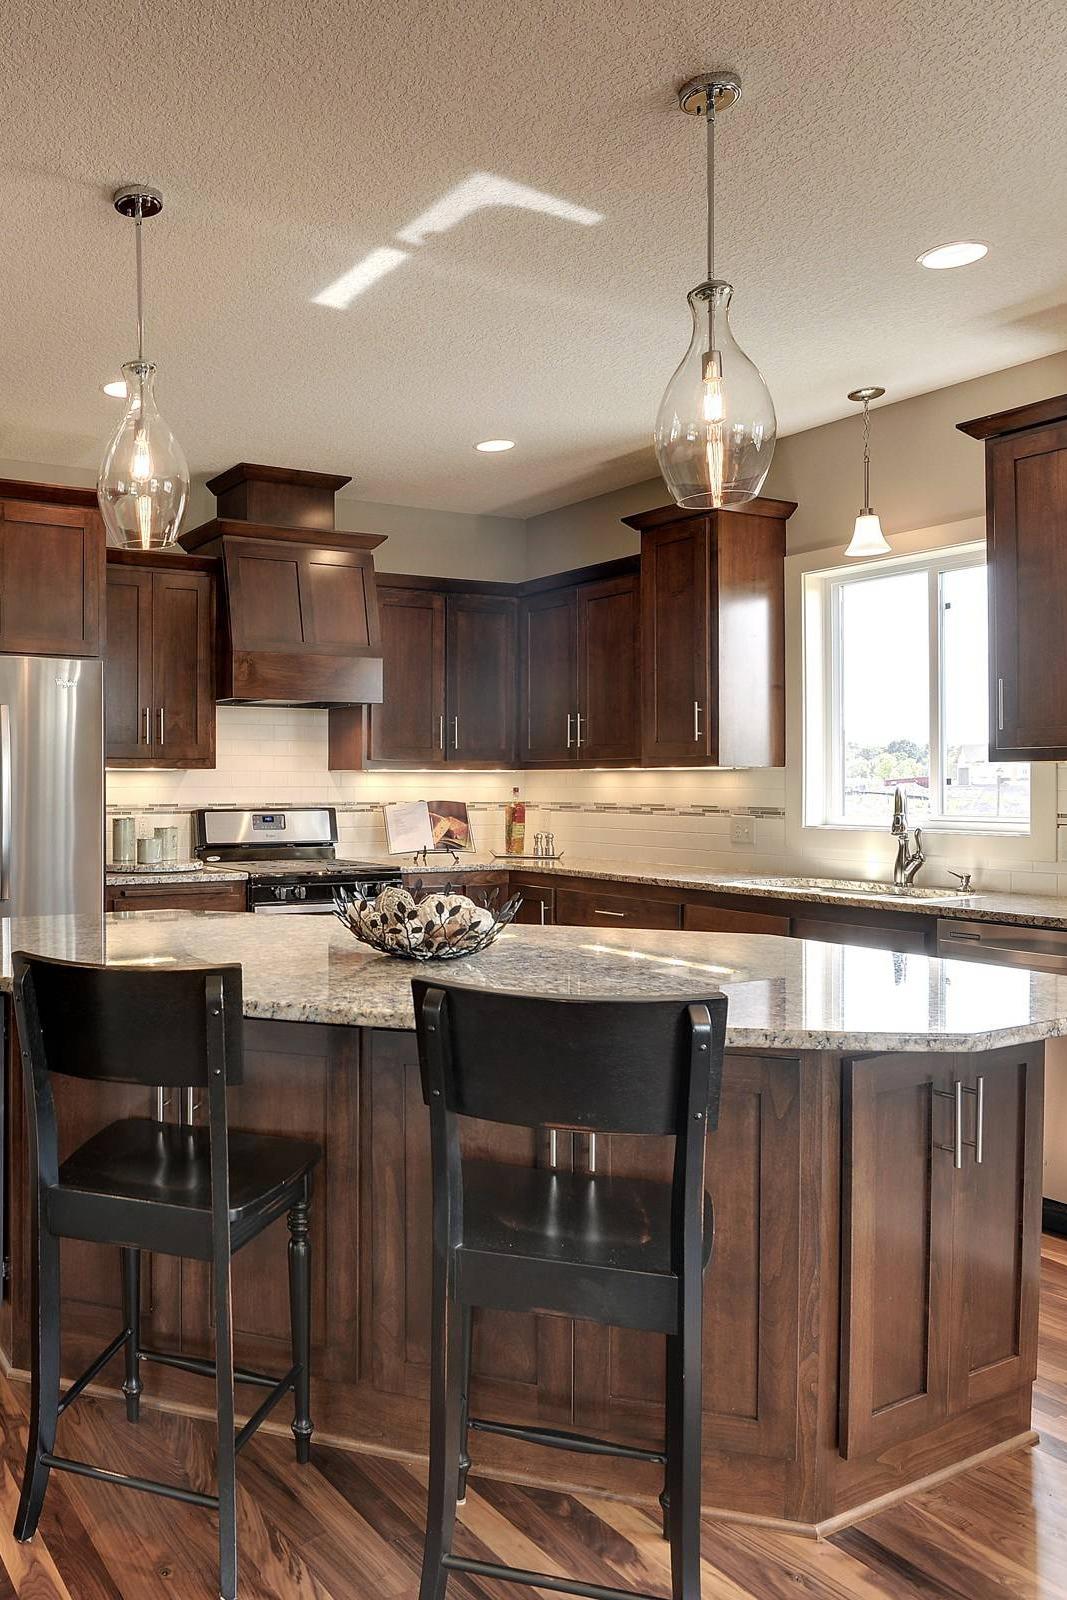 38 Popular White Granite Countertop Dark Cabinets on Black Granite Countertops With Brown Cabinets  id=62549